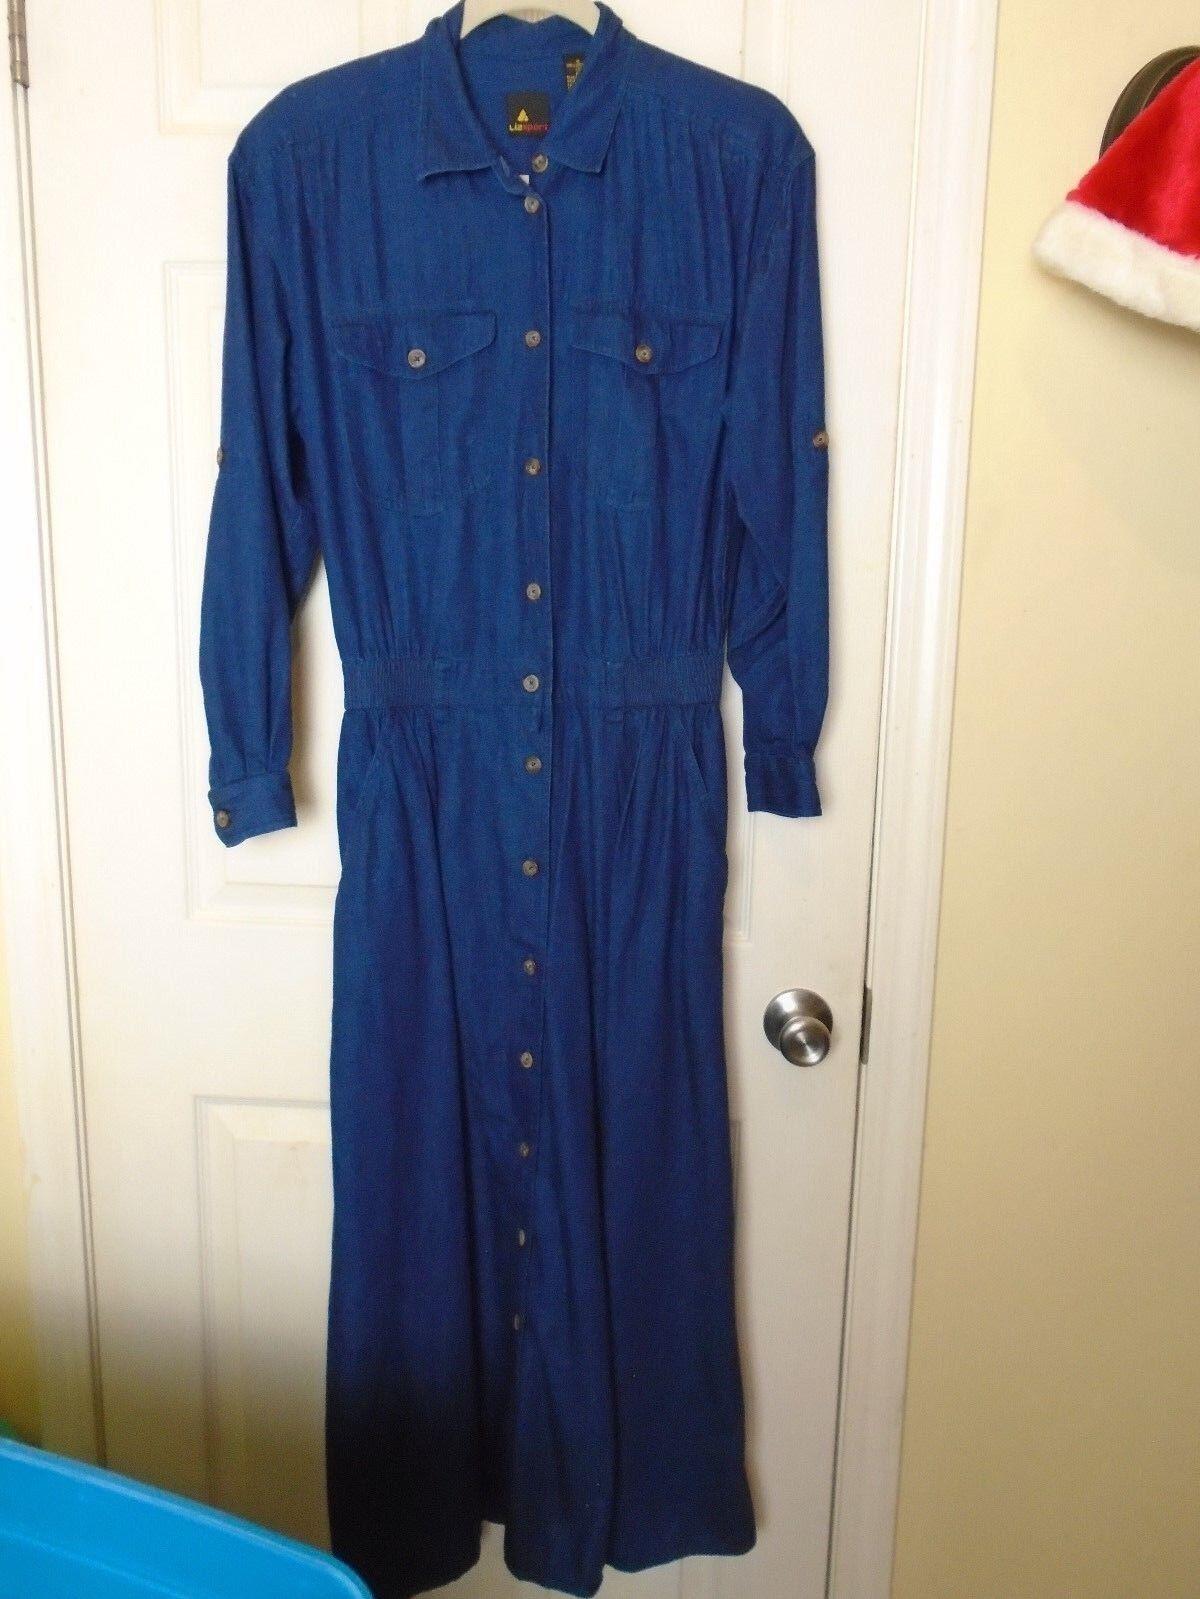 Liz Sport Liz Clairborne Vintage 80s Navy  Jumpsuit style skirt  Size 8